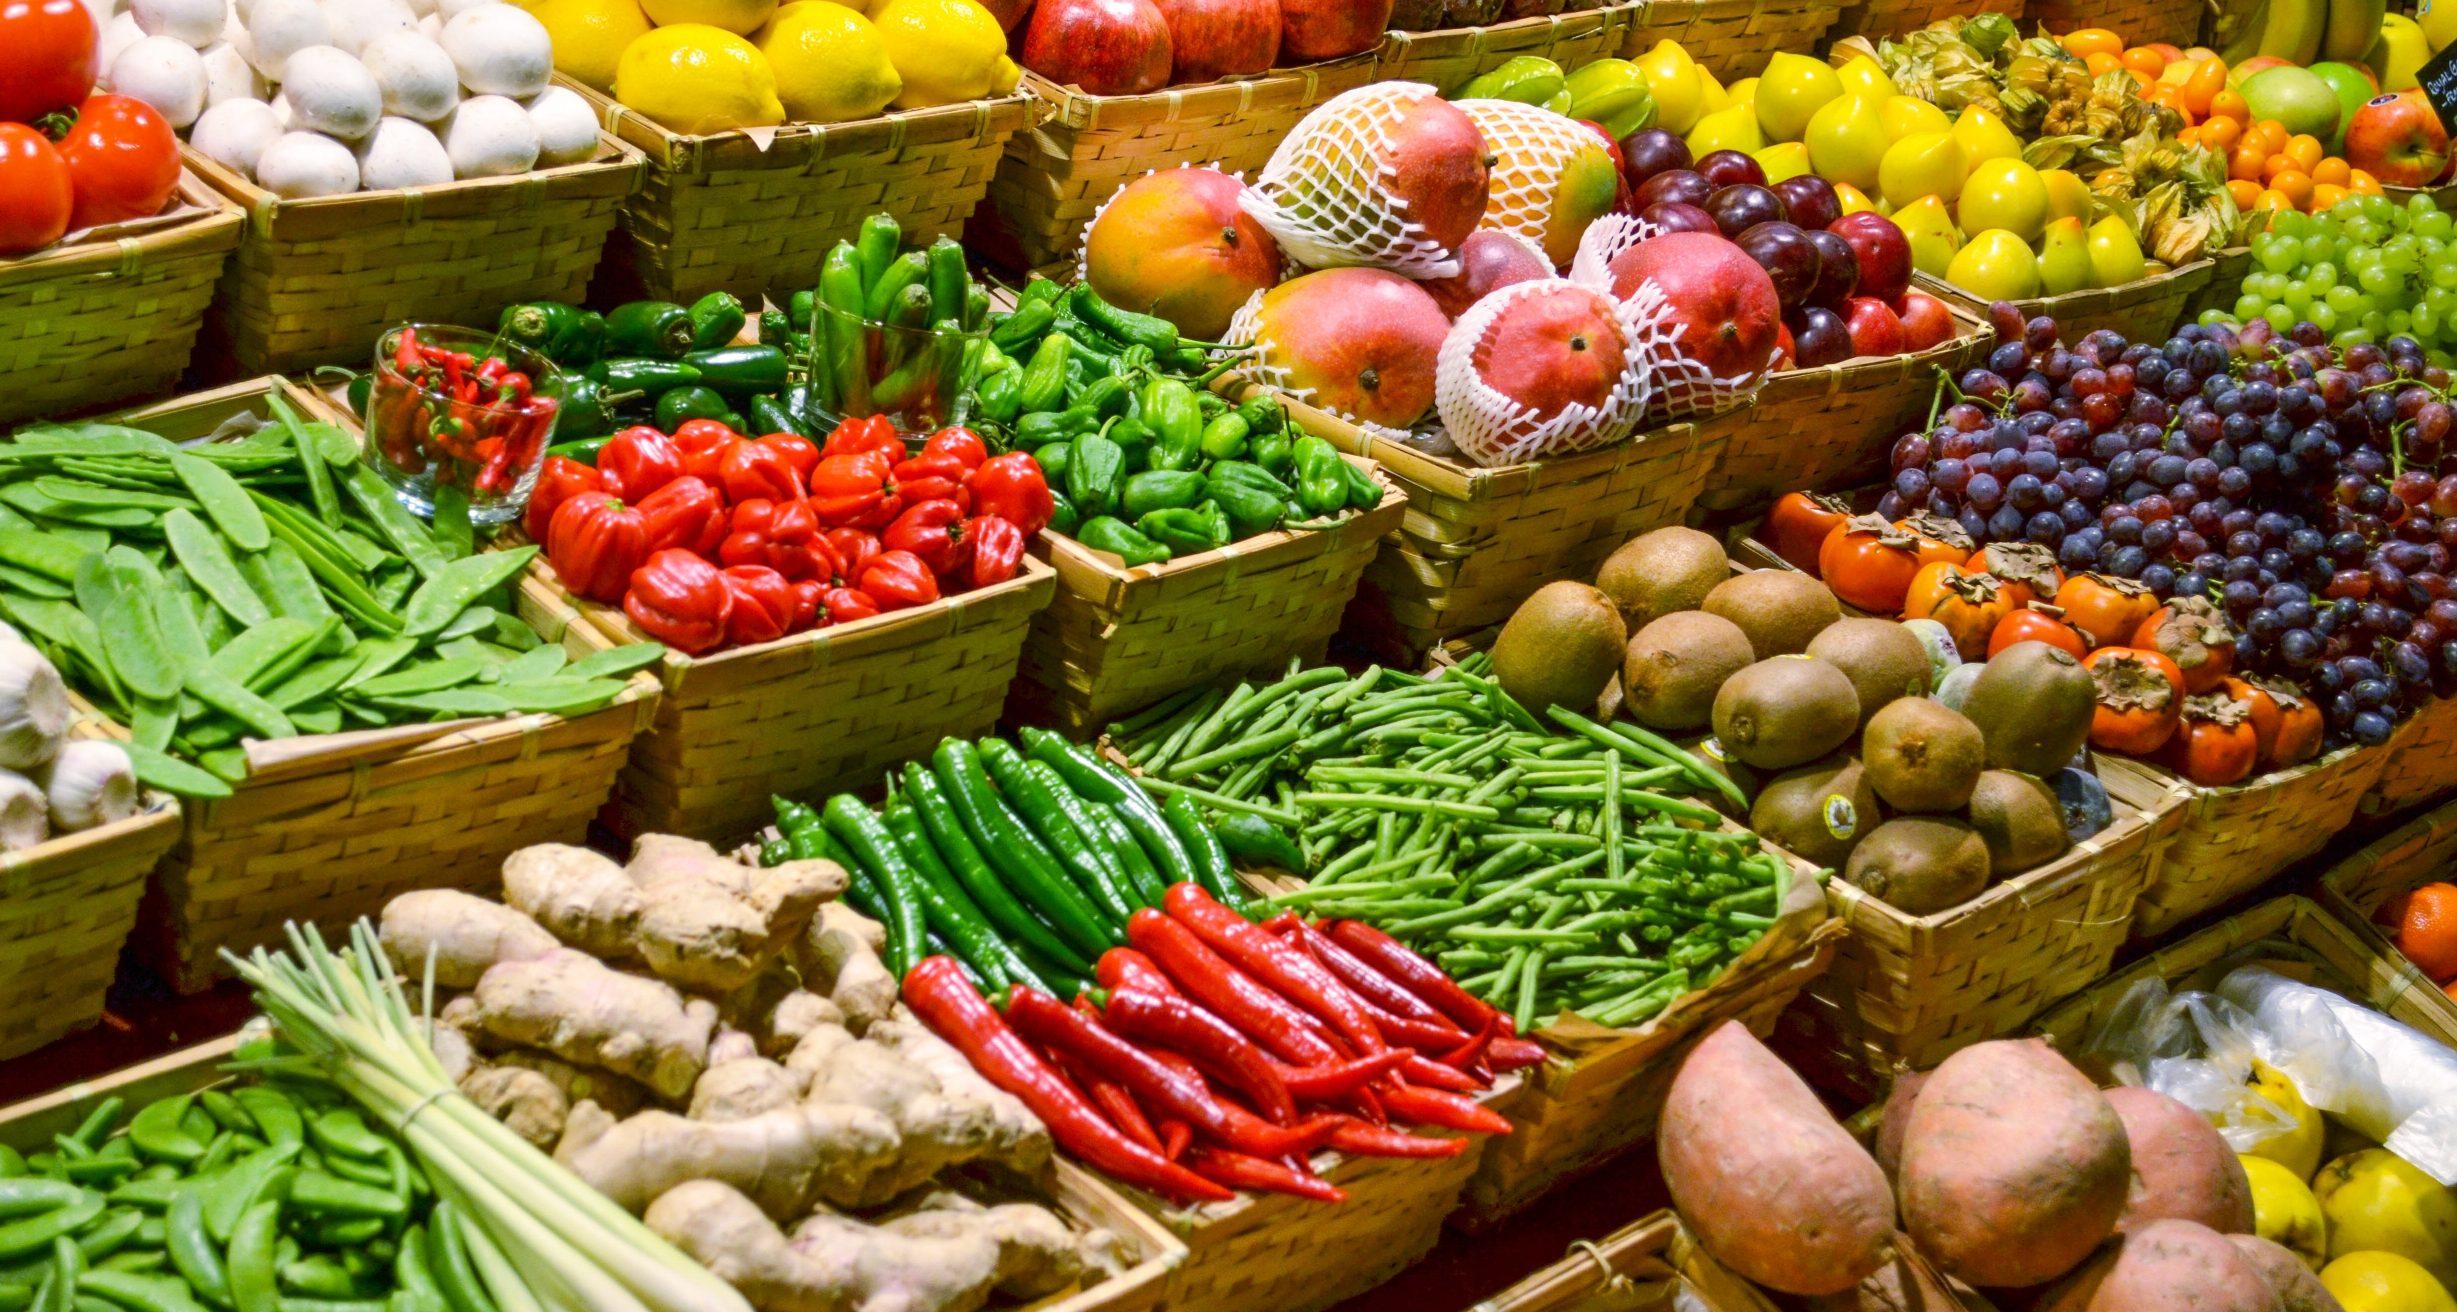 Markham organic groceries